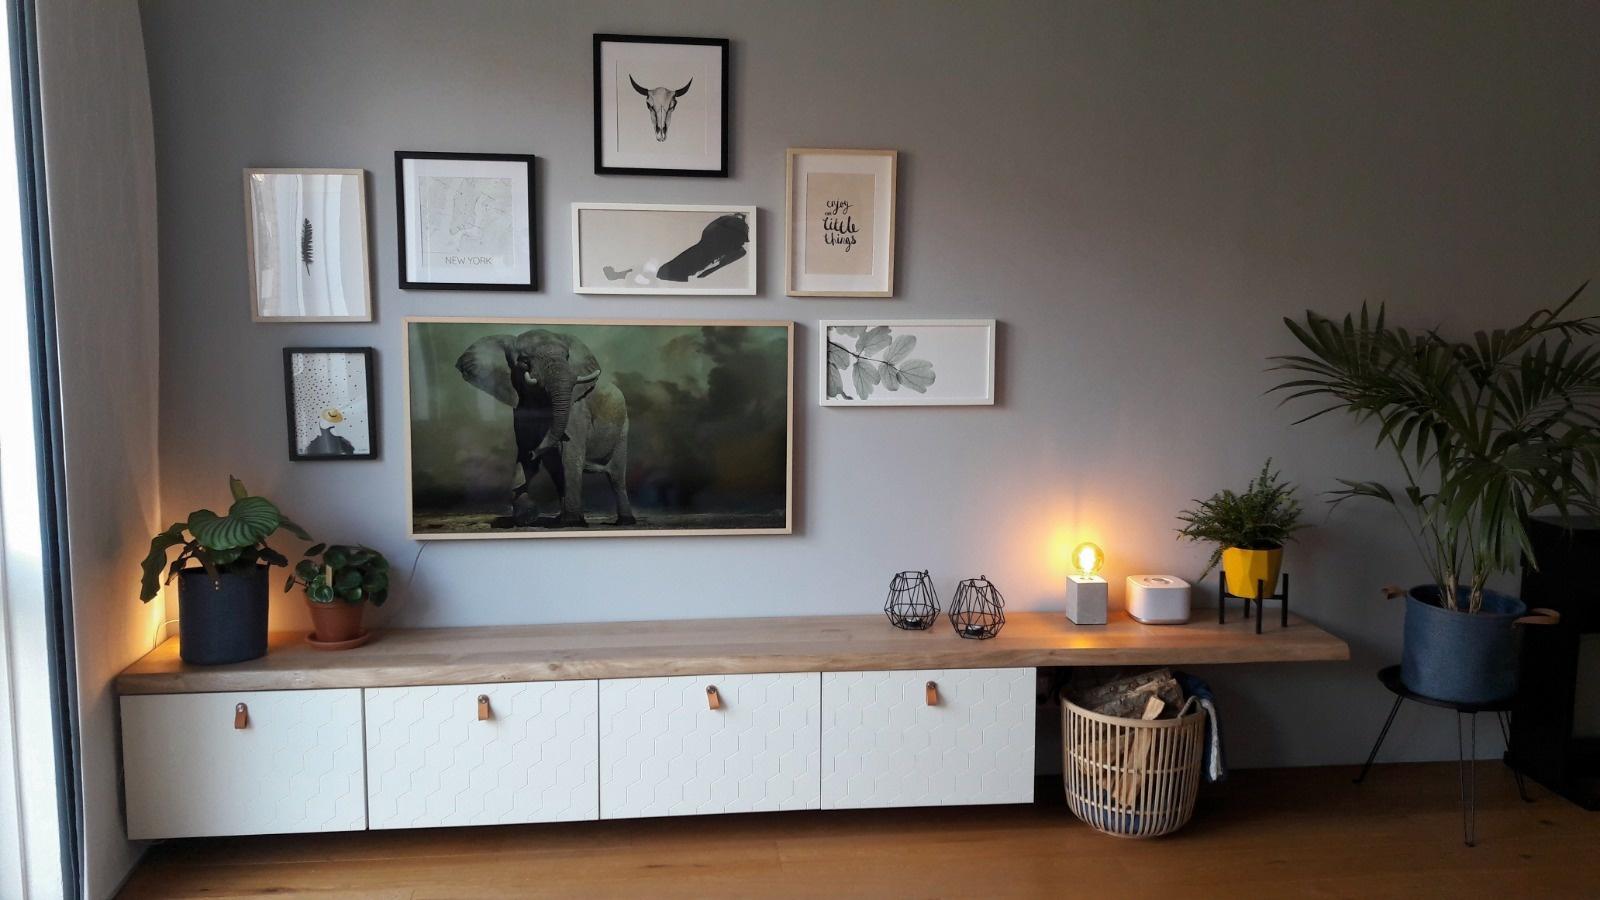 Ikea Boekenkast Tv Meubel.Besta Tv Meubel Eikenhouten Plank Boomstam Tafels